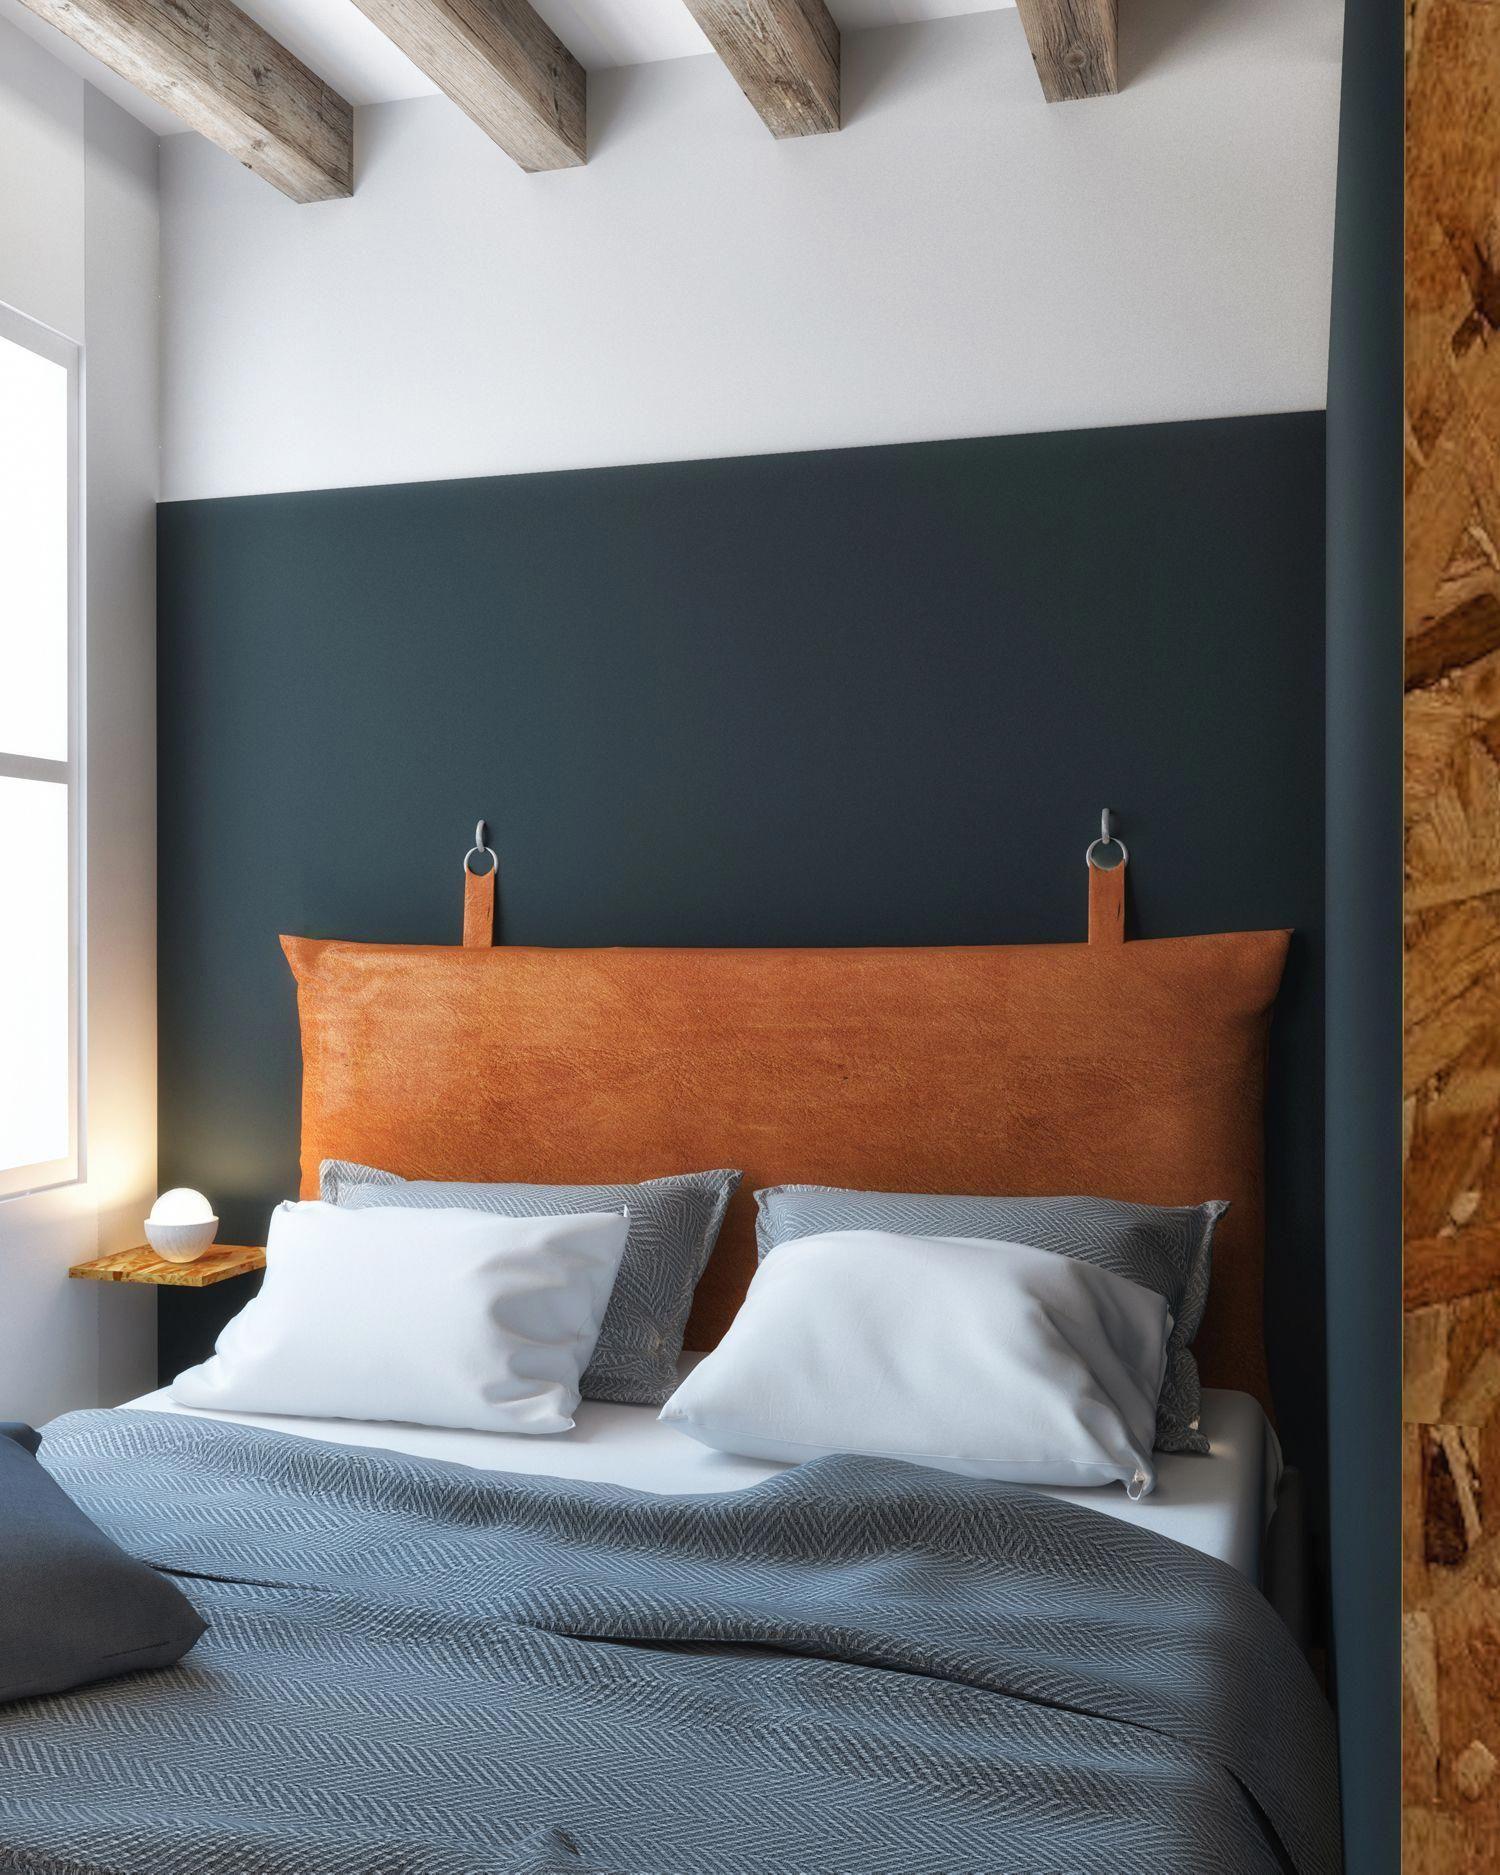 14 Dreamy Diy Headboard Ideas: Furniture #DiscountFurnitureStores Key: 8340015286